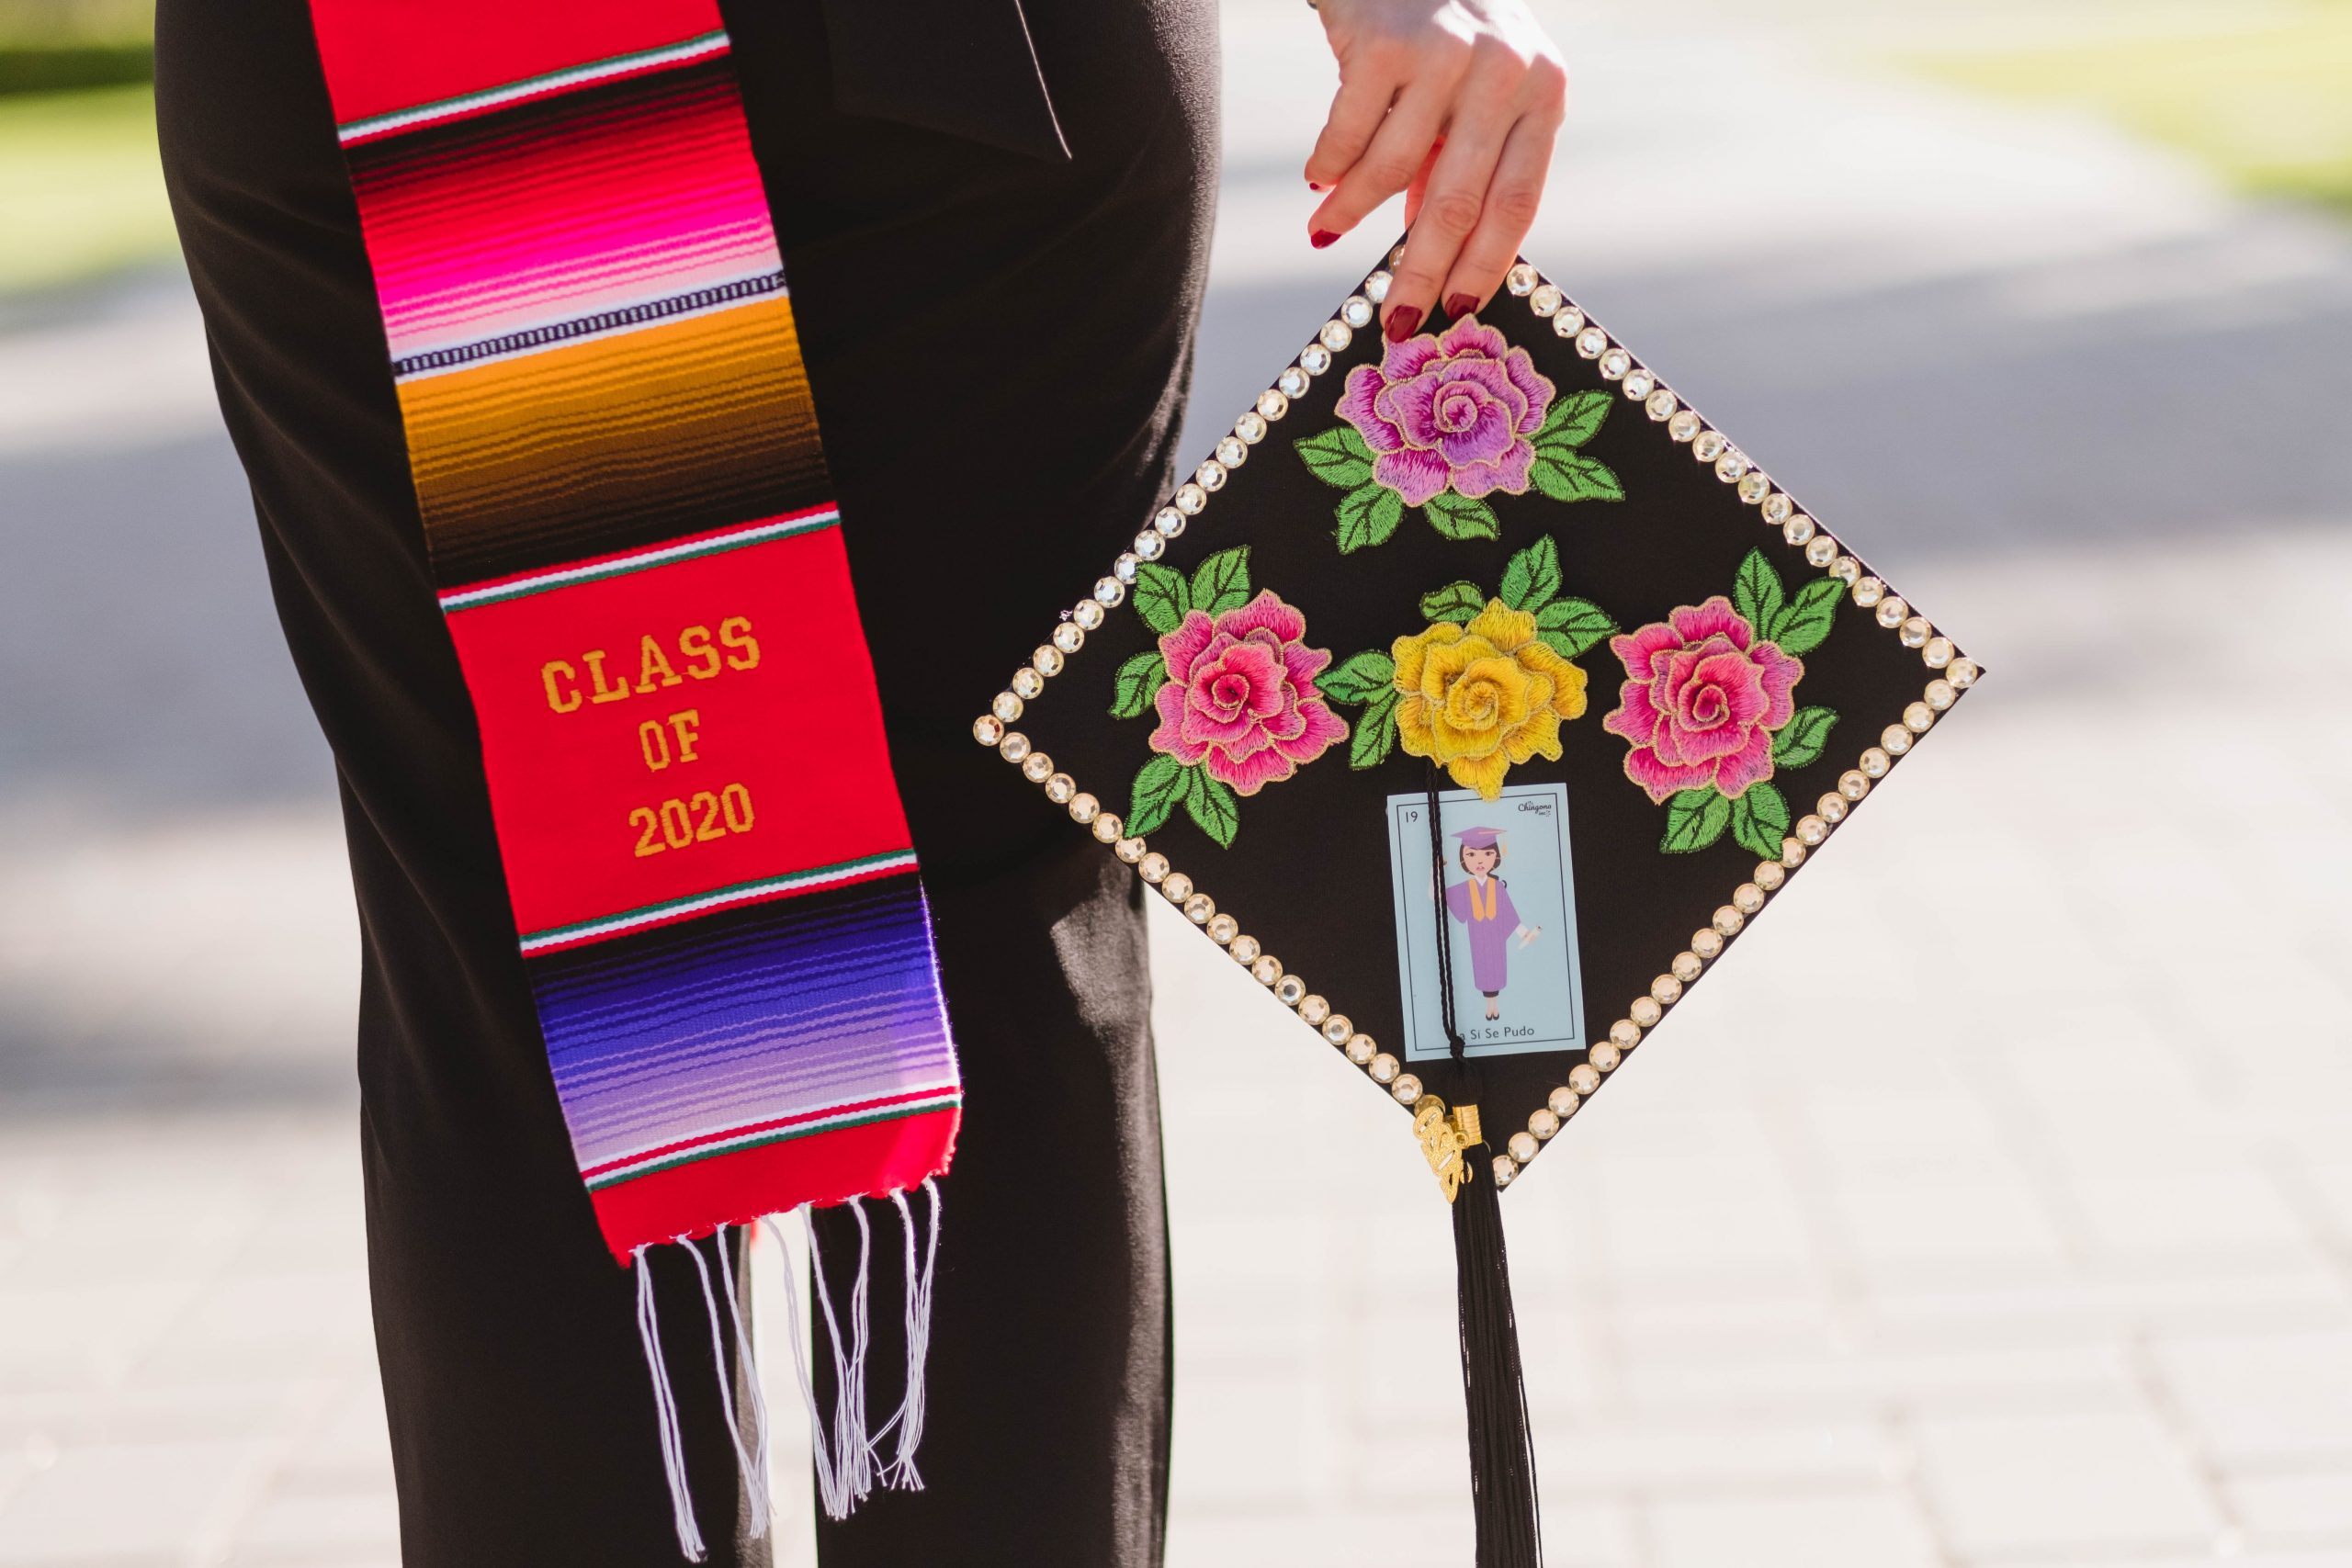 Class of 2020 Decorated Graduation Cap